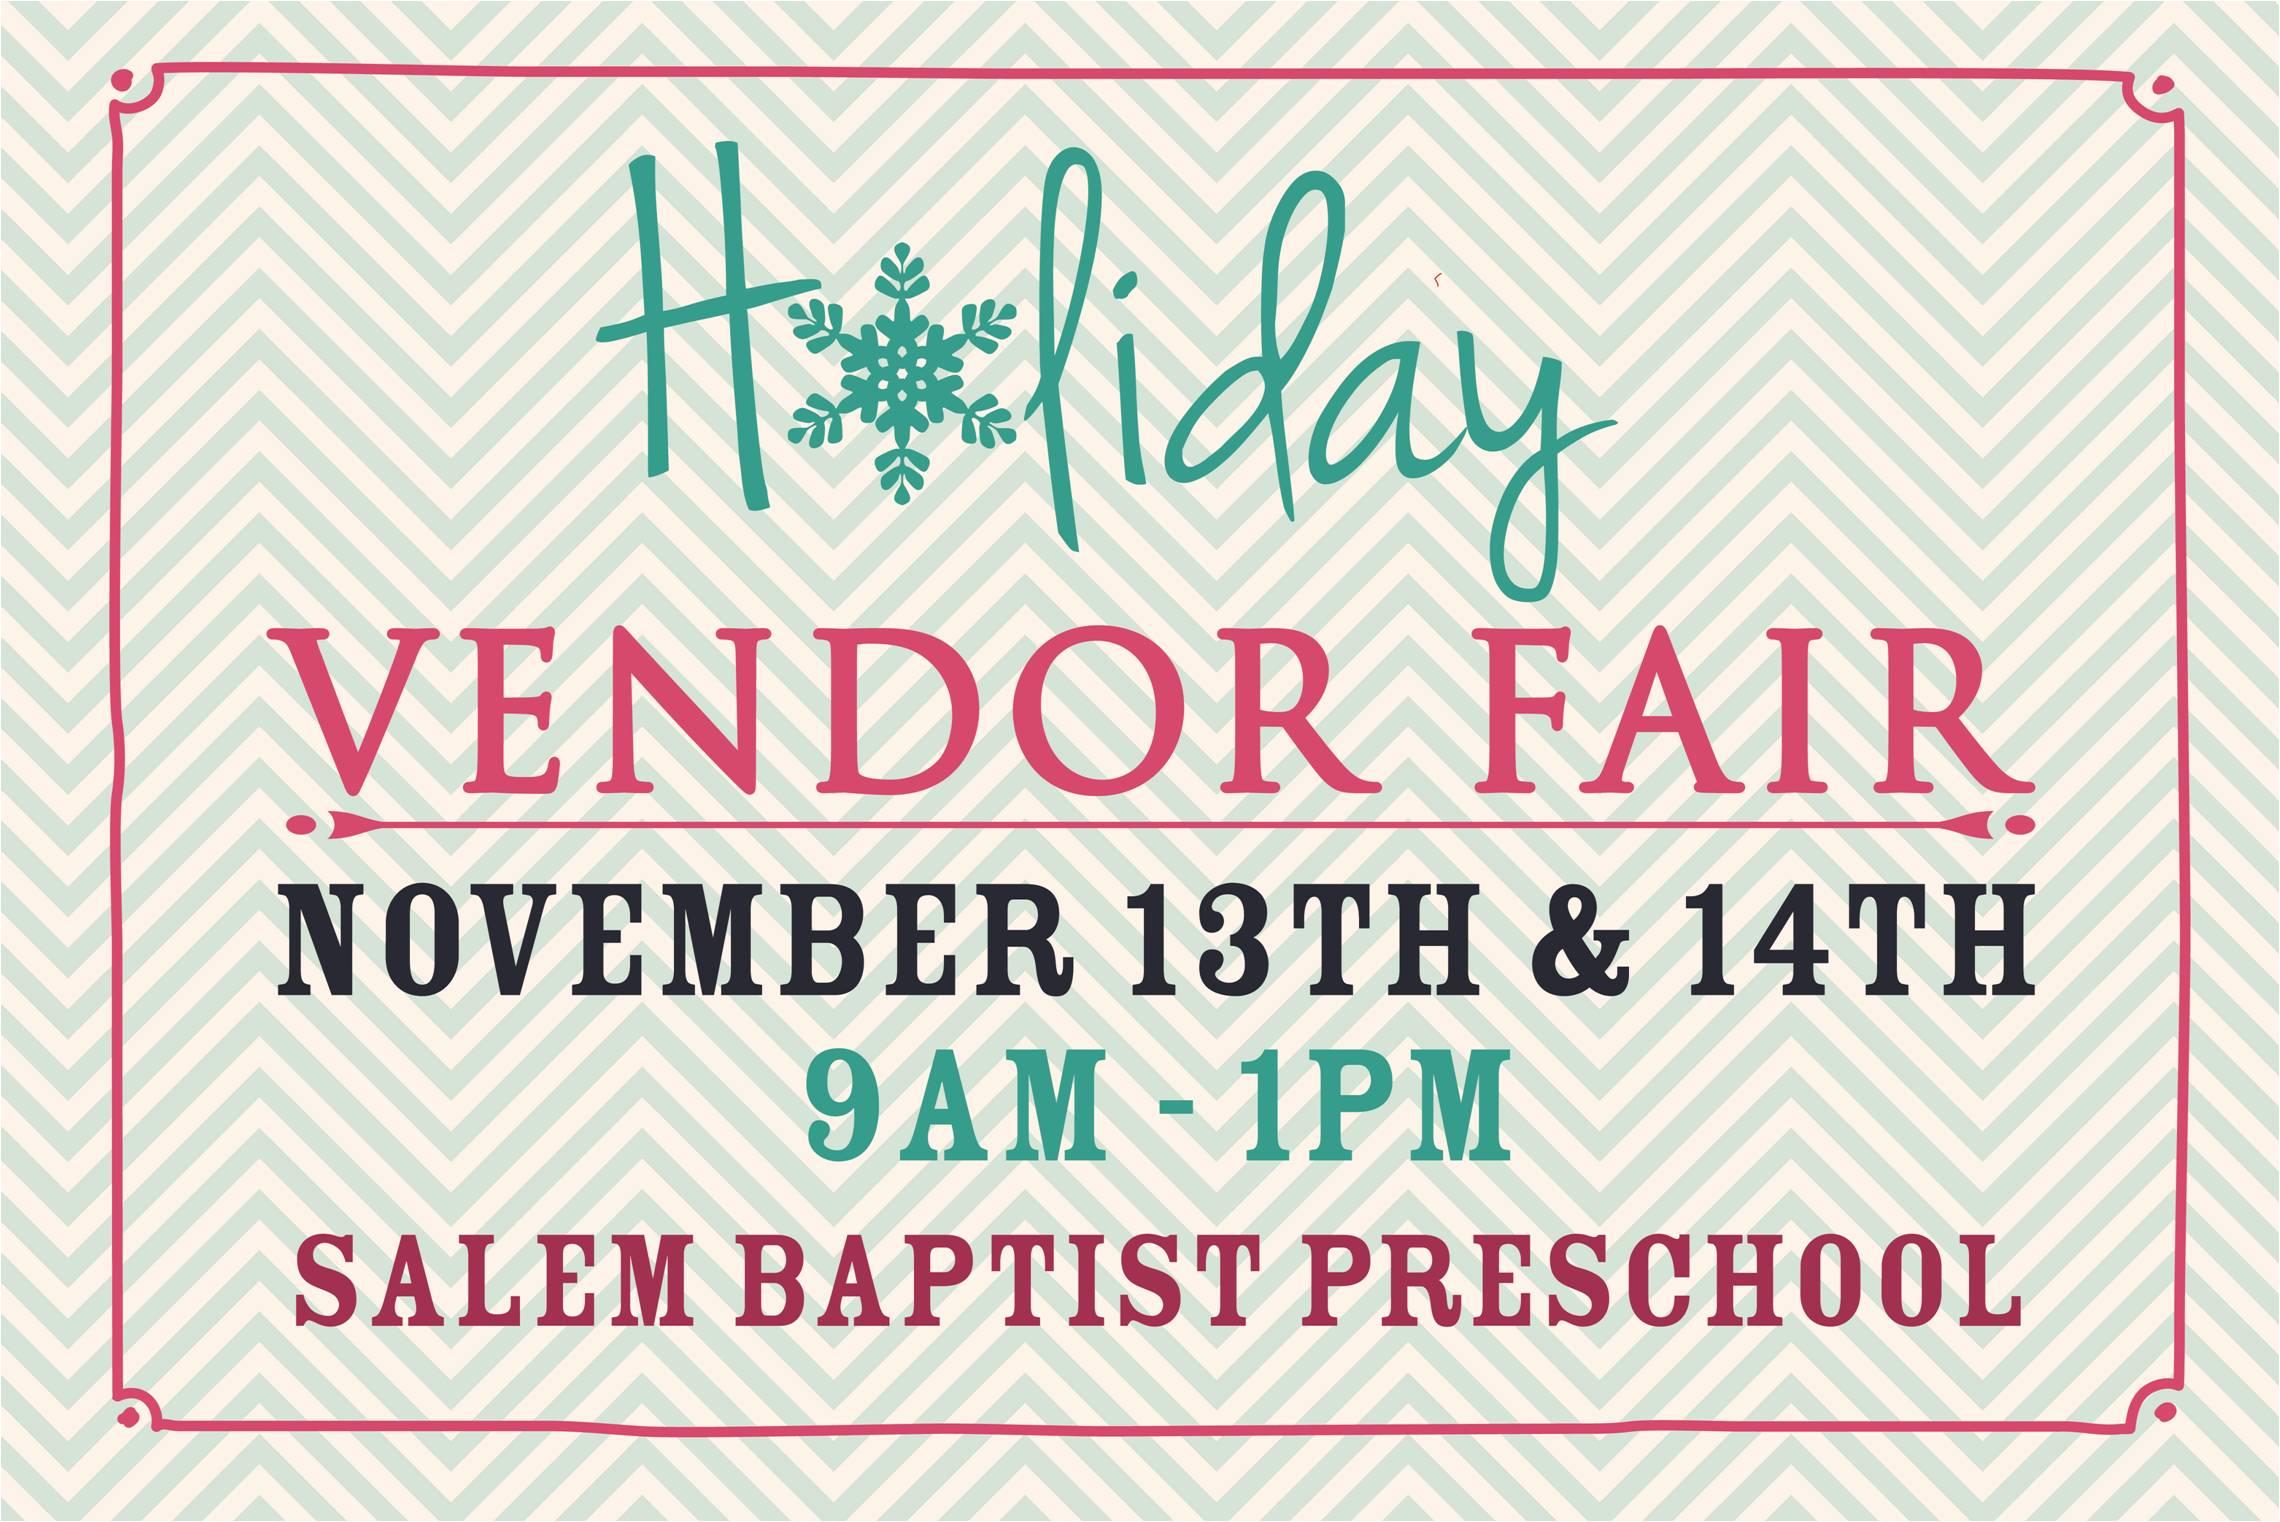 Raleigh Vendor Fair, Raleigh Craft Fair